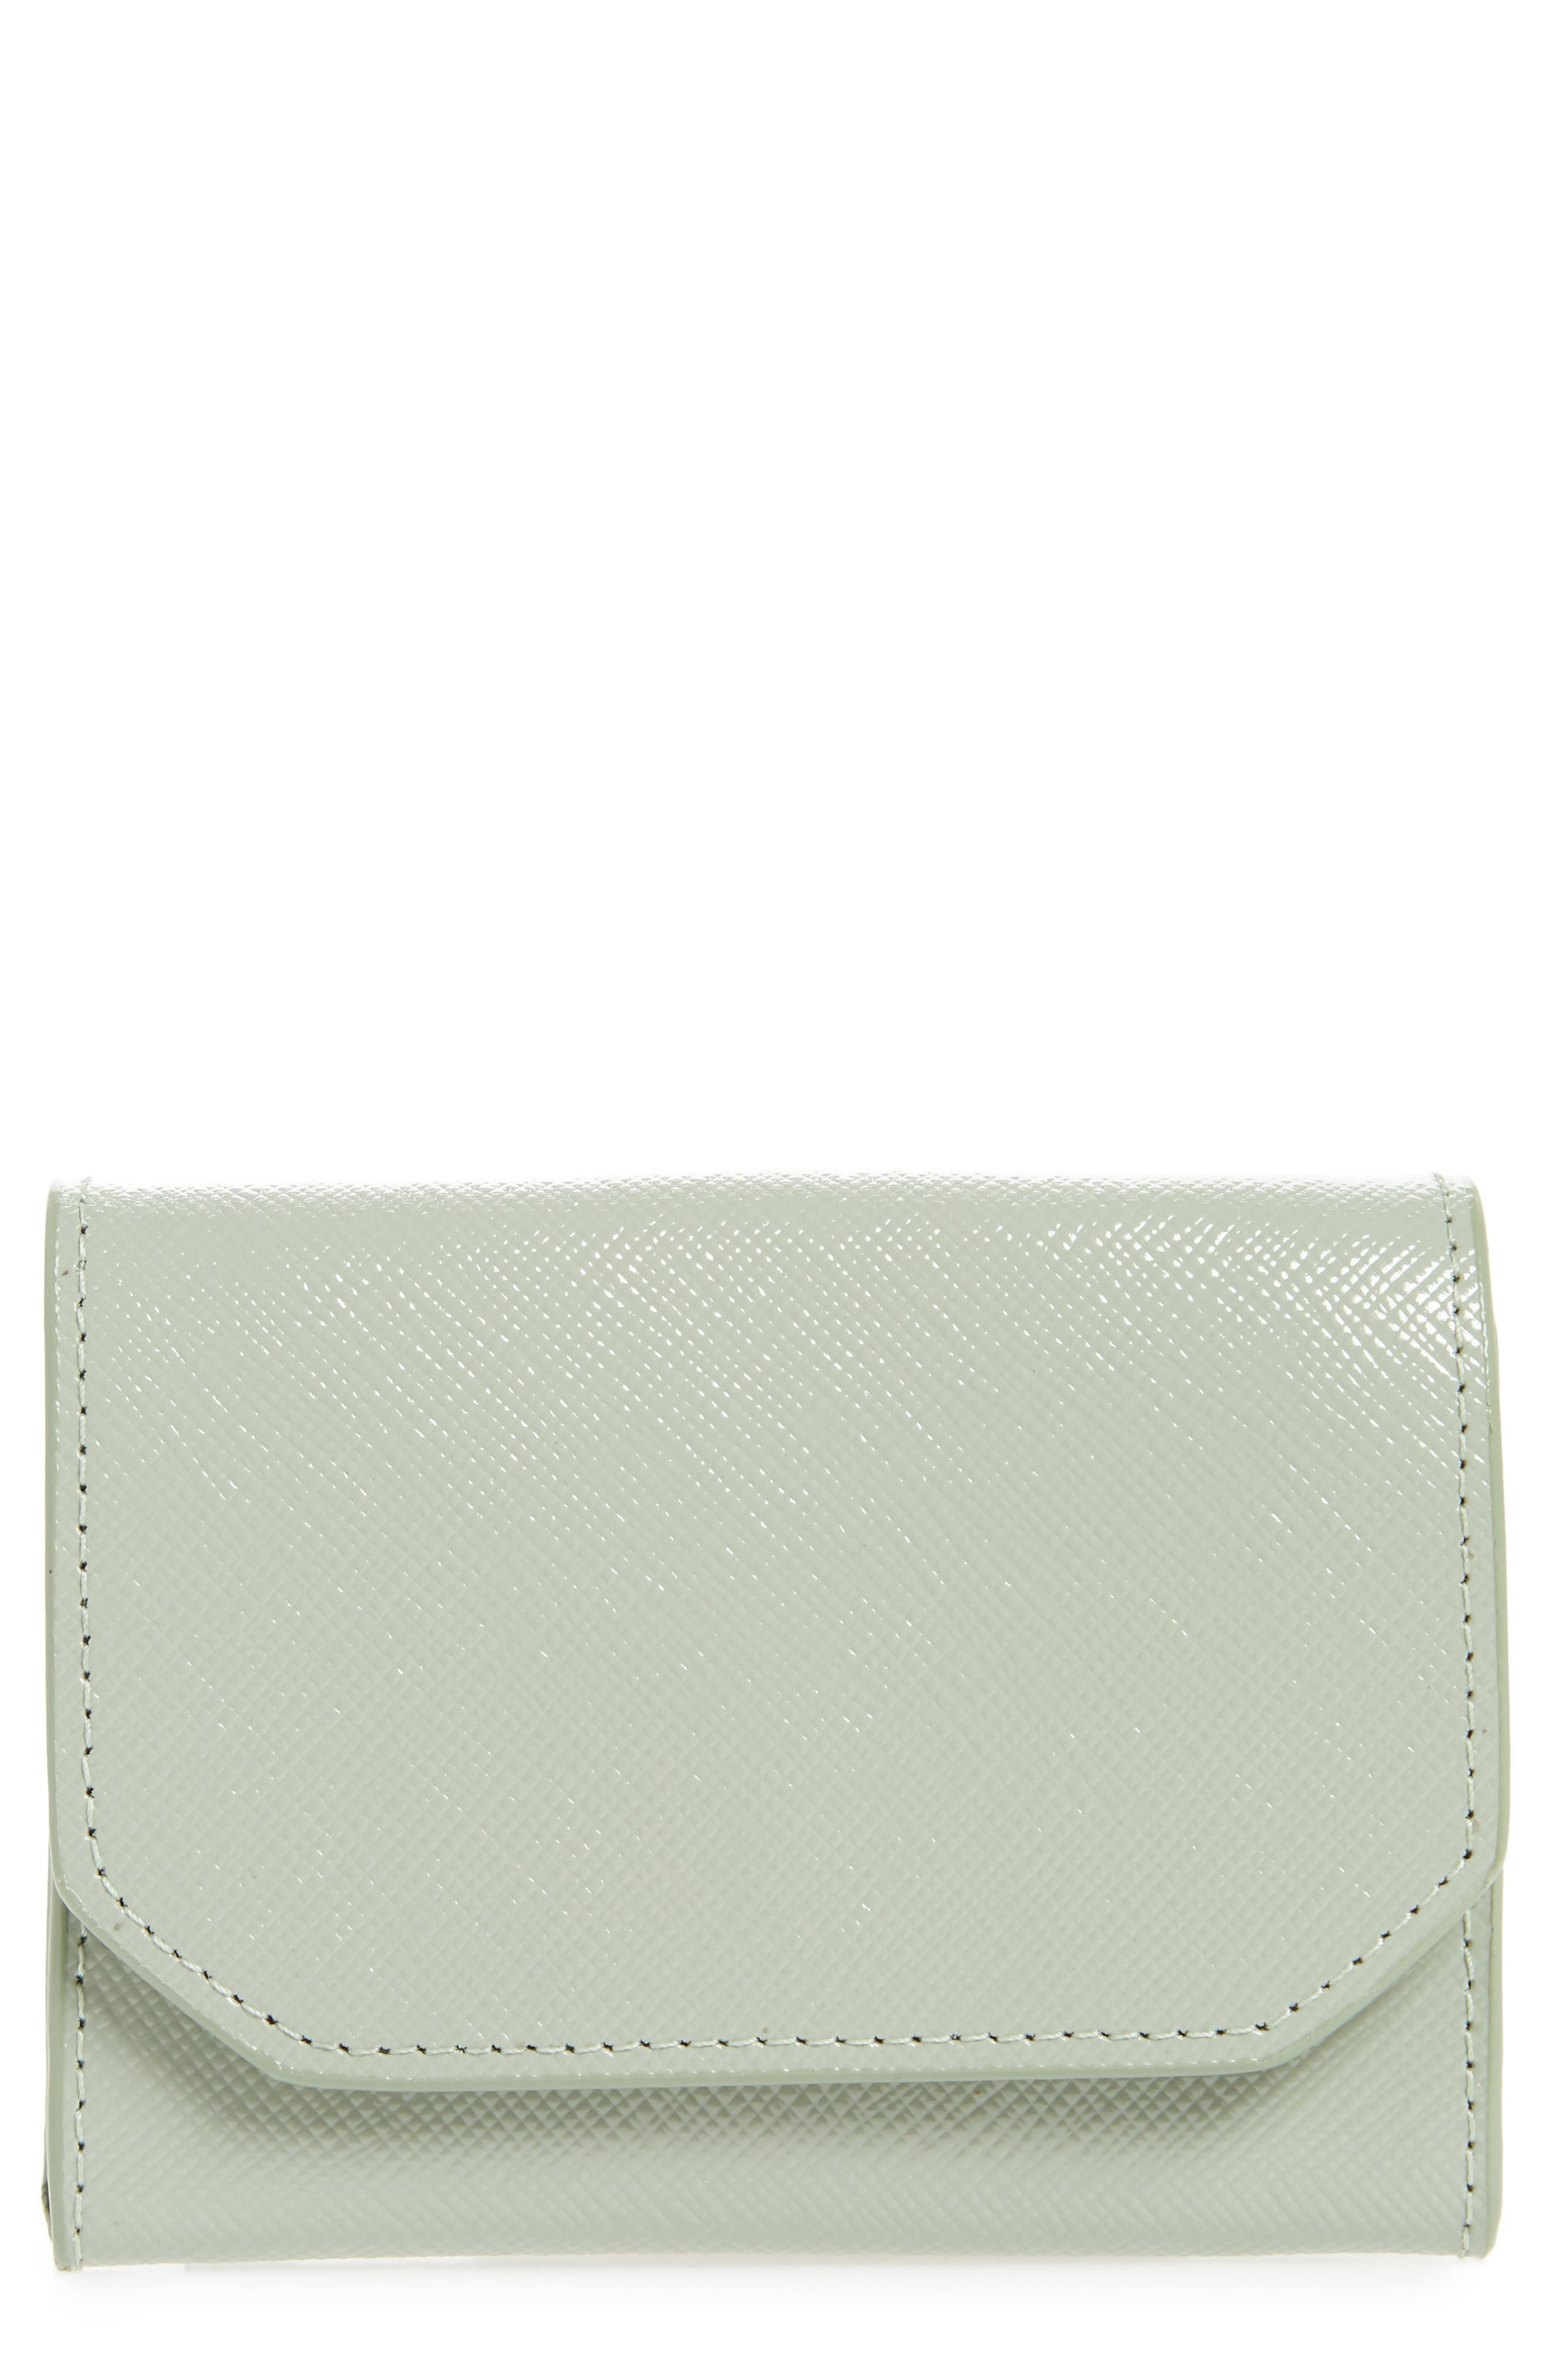 Envelope Card Holder,                             Main thumbnail 1, color,                             Green Screen